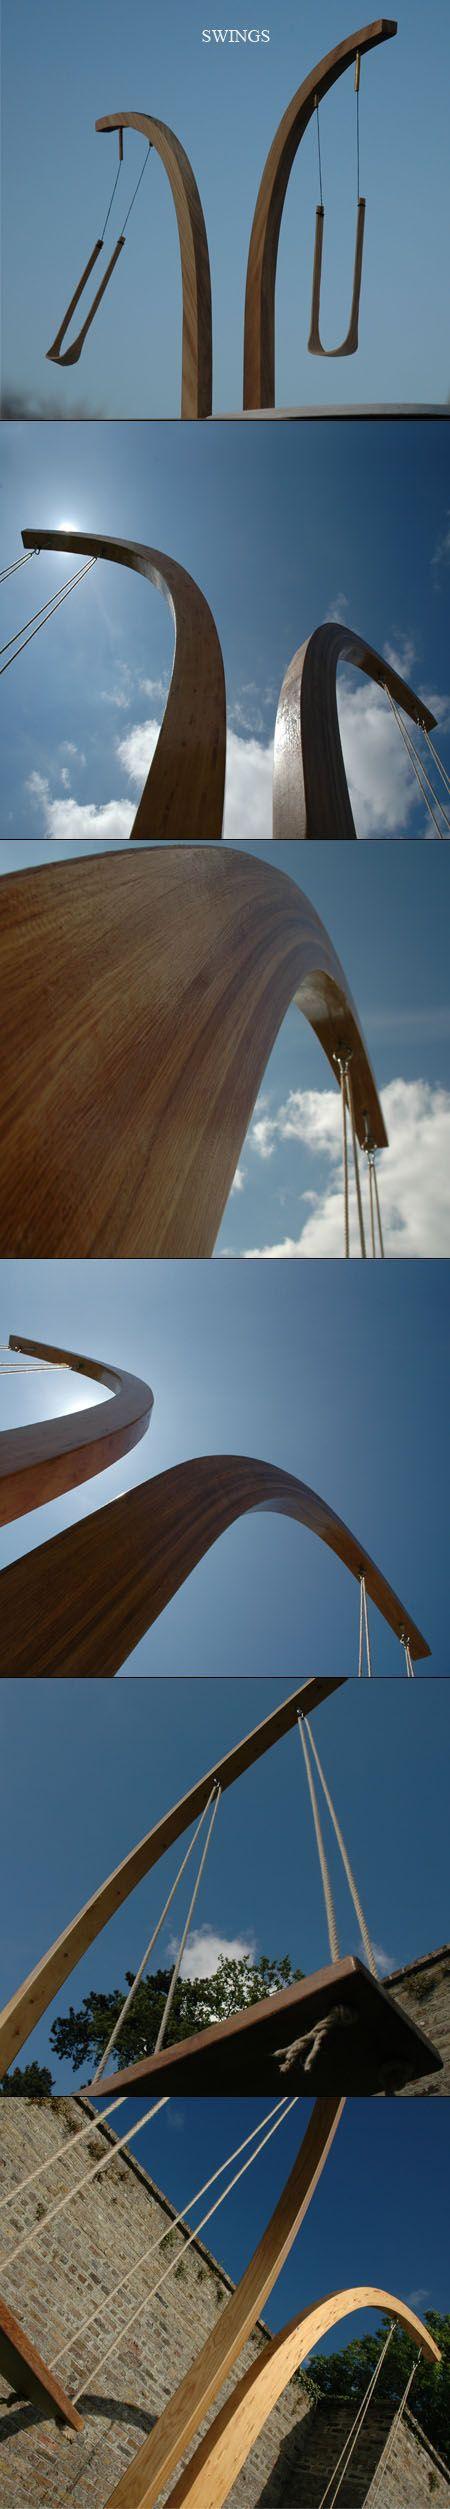 outdoor sculpture swing timber